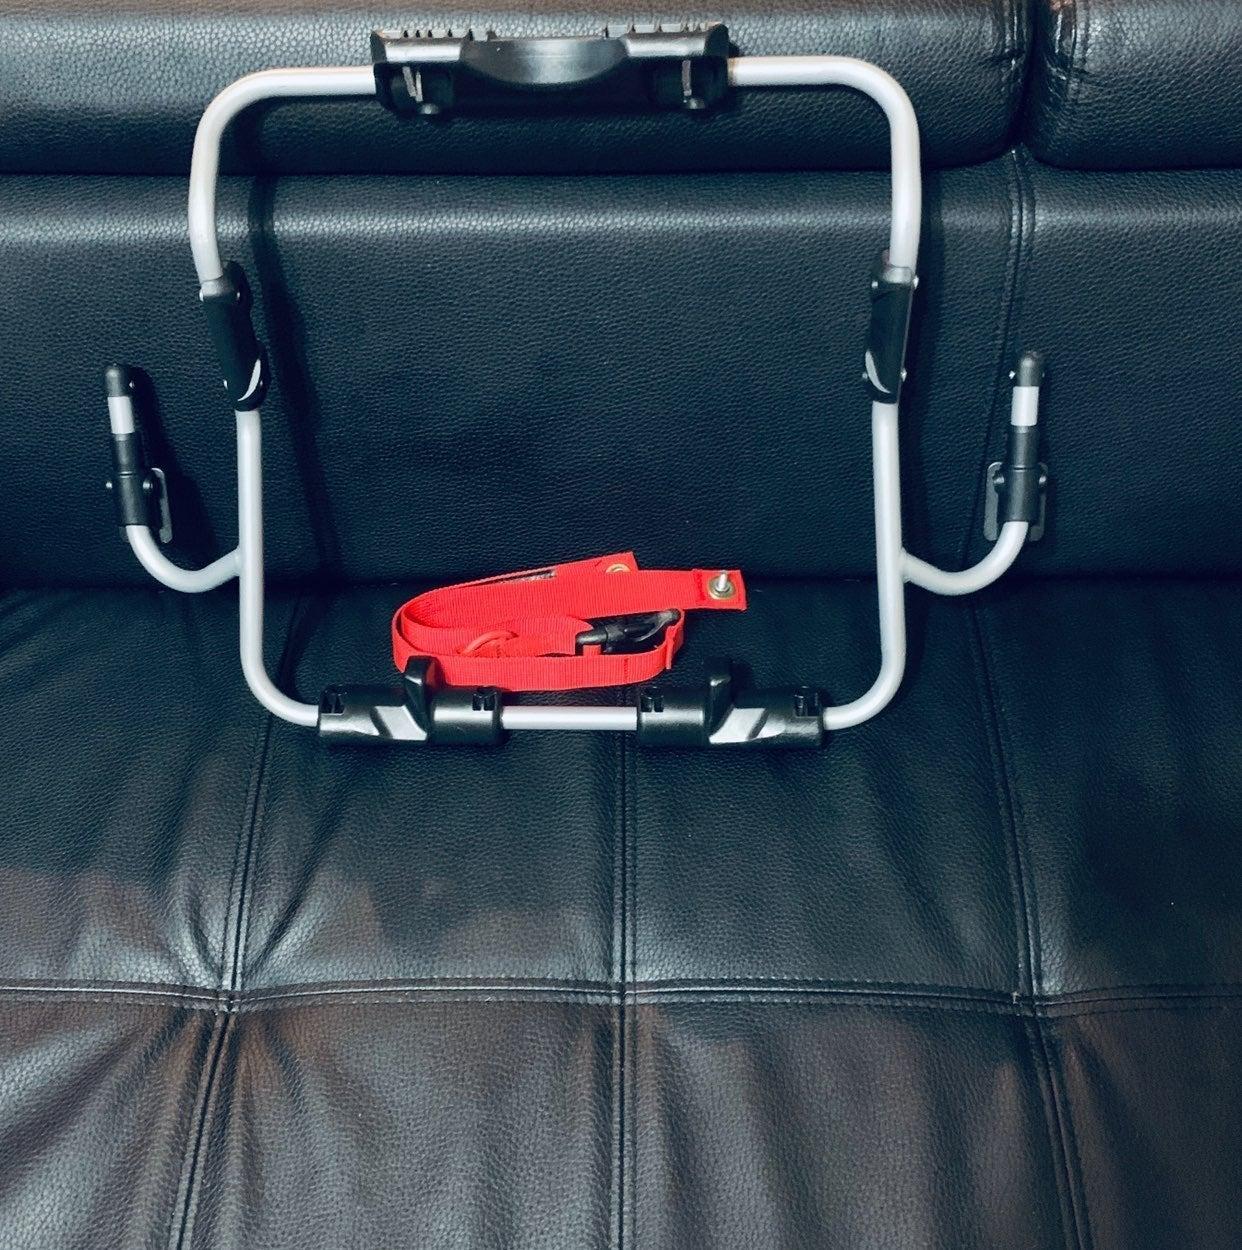 ⭐️ Graco Bob single stroller adapter